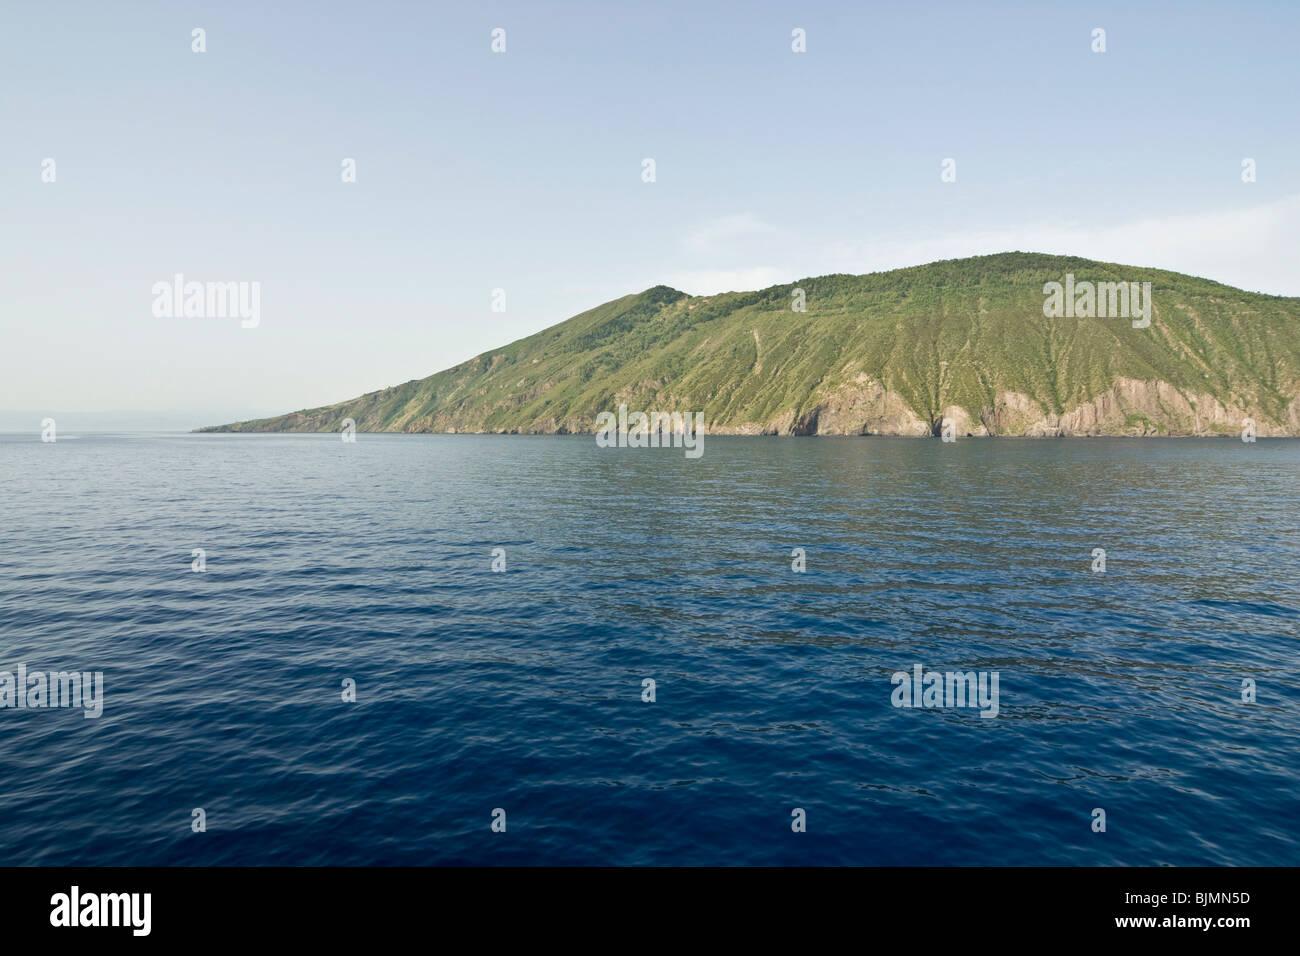 Italien, Sizilien, Liparische Inseln, Insel Vulcano Im Meer | Italien, Sizilien, Liparischen Inseln, Insel Vulcano Stockbild